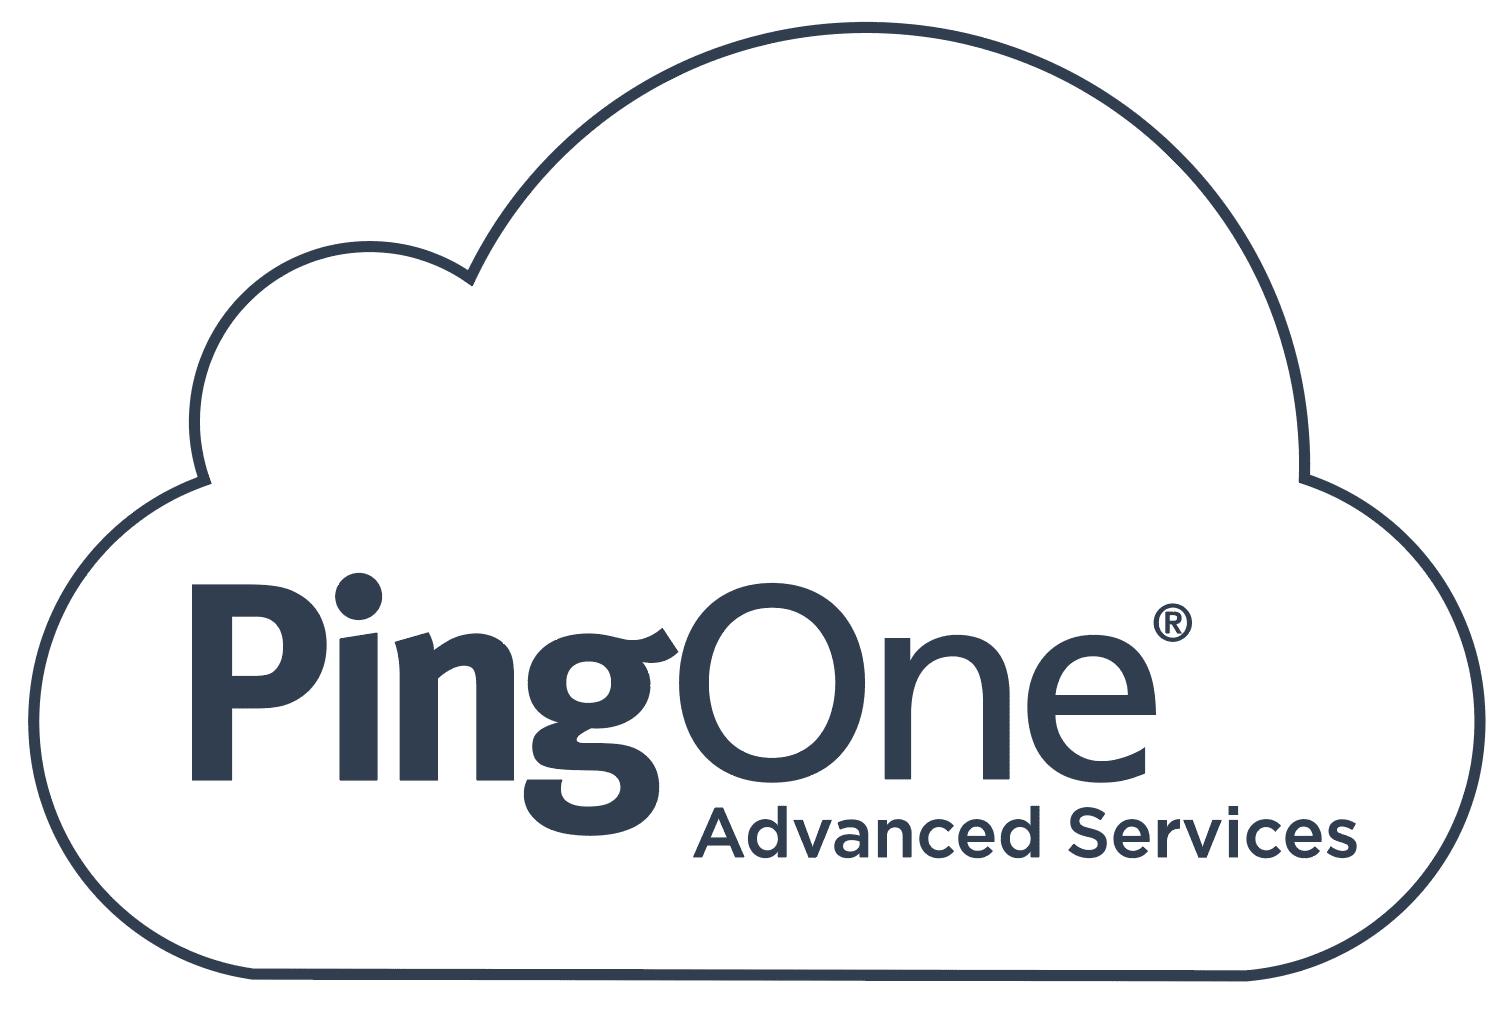 PingOne Advanced Services logo